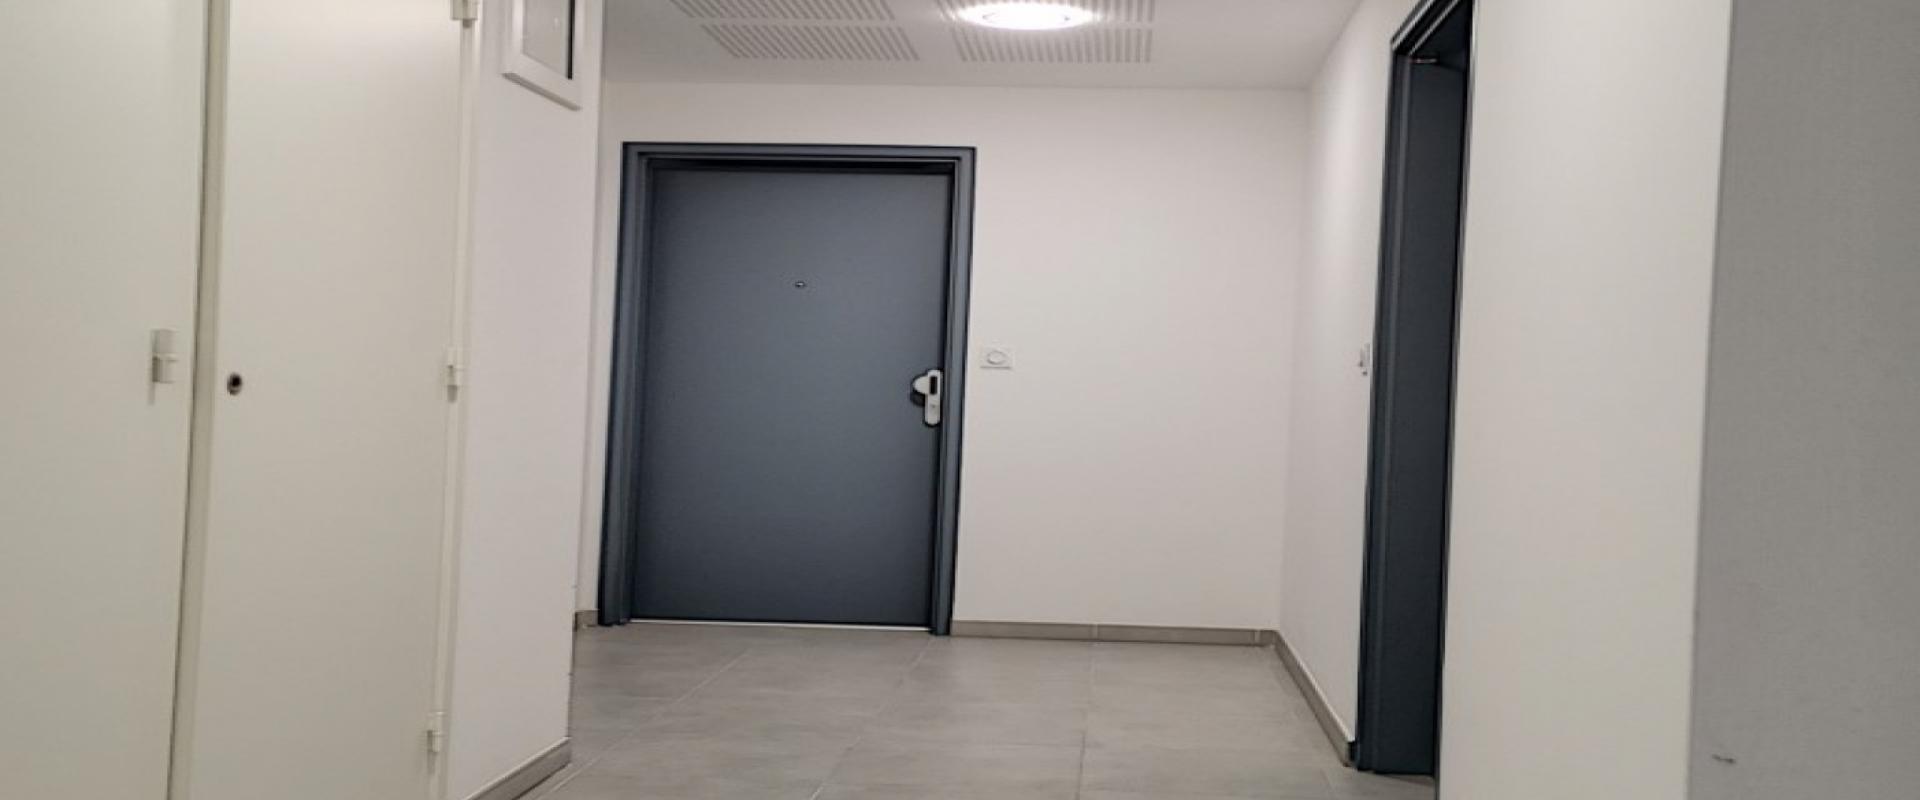 F3 neuf à louer Carré Bodiccione hall entrée